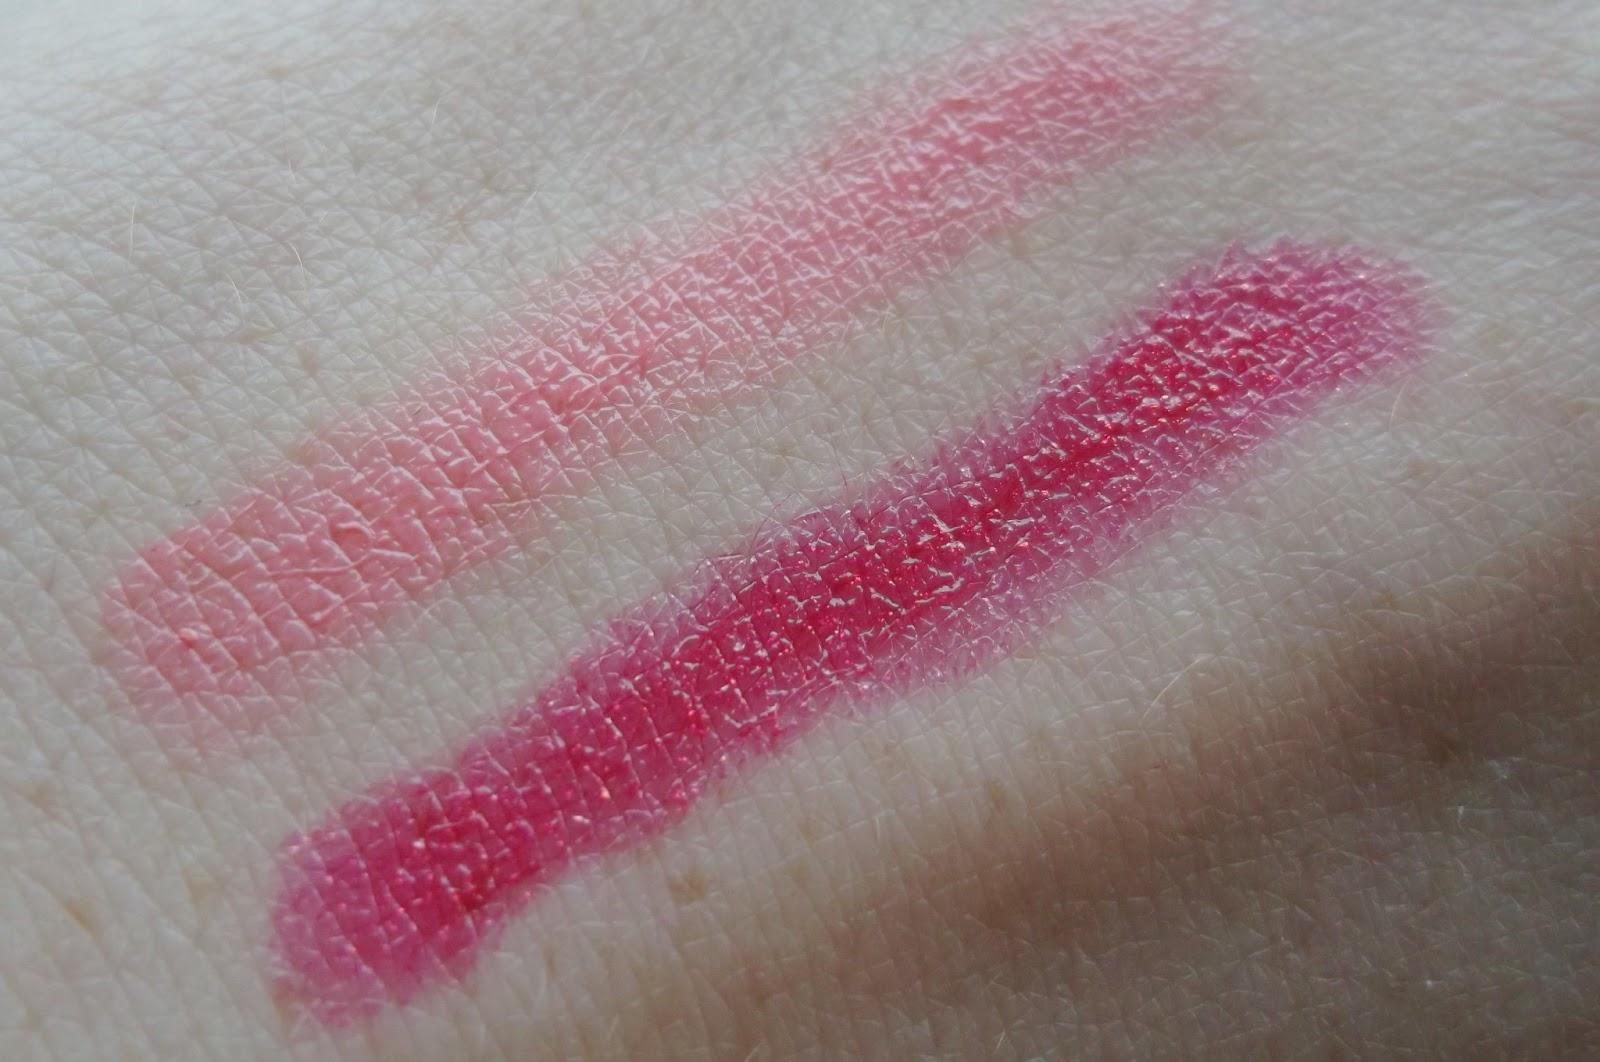 She's a Beaut: Australis Show Stopper Gloss Sticks in Fairy Floss